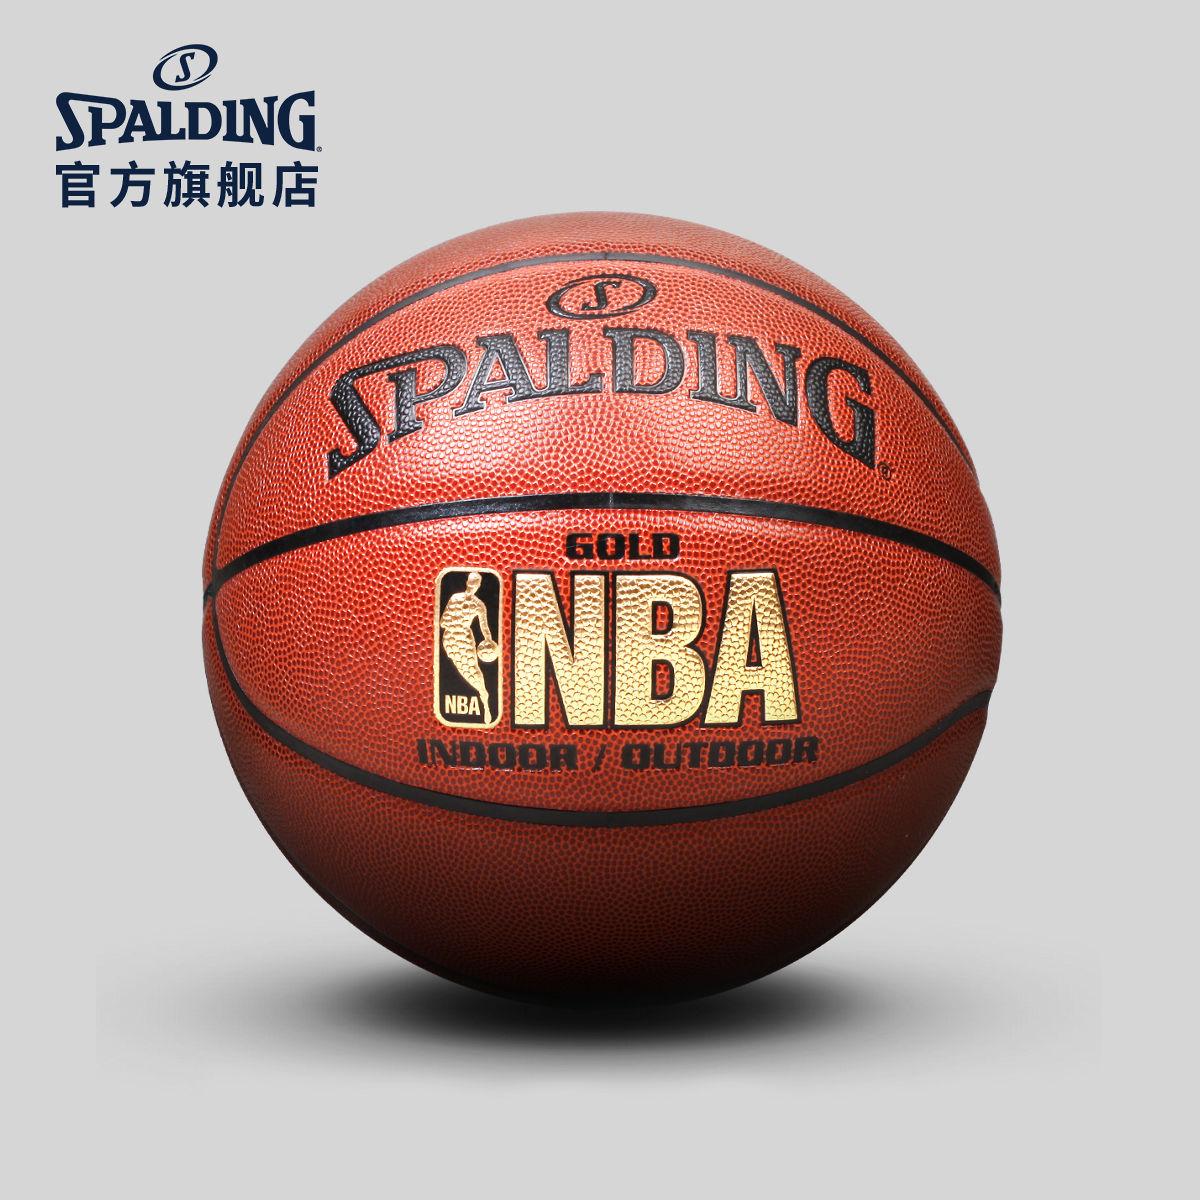 Товары для баскетбола Артикул 38046685926